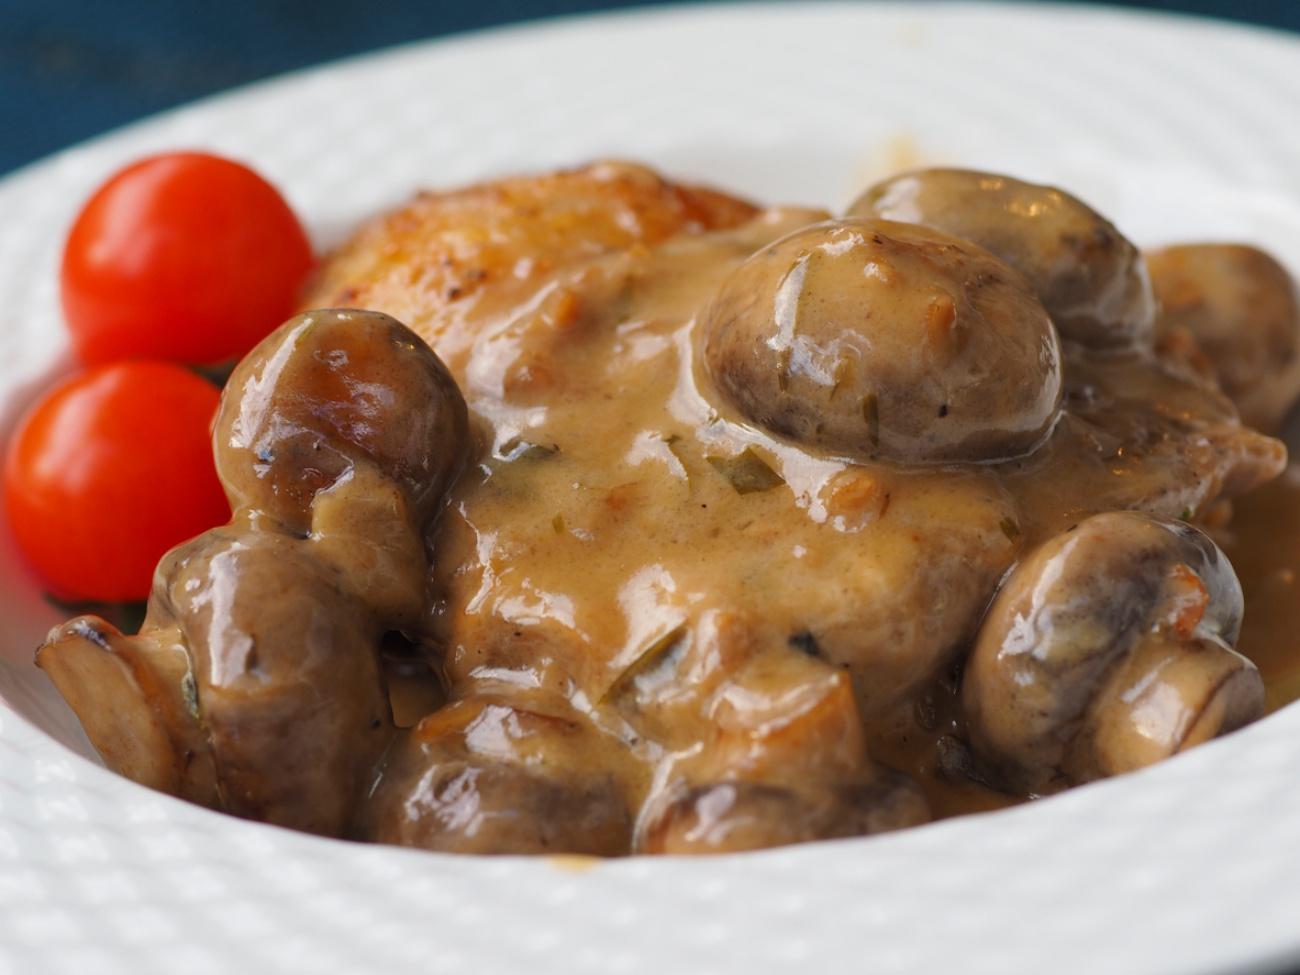 Braised chicken and mushrooms